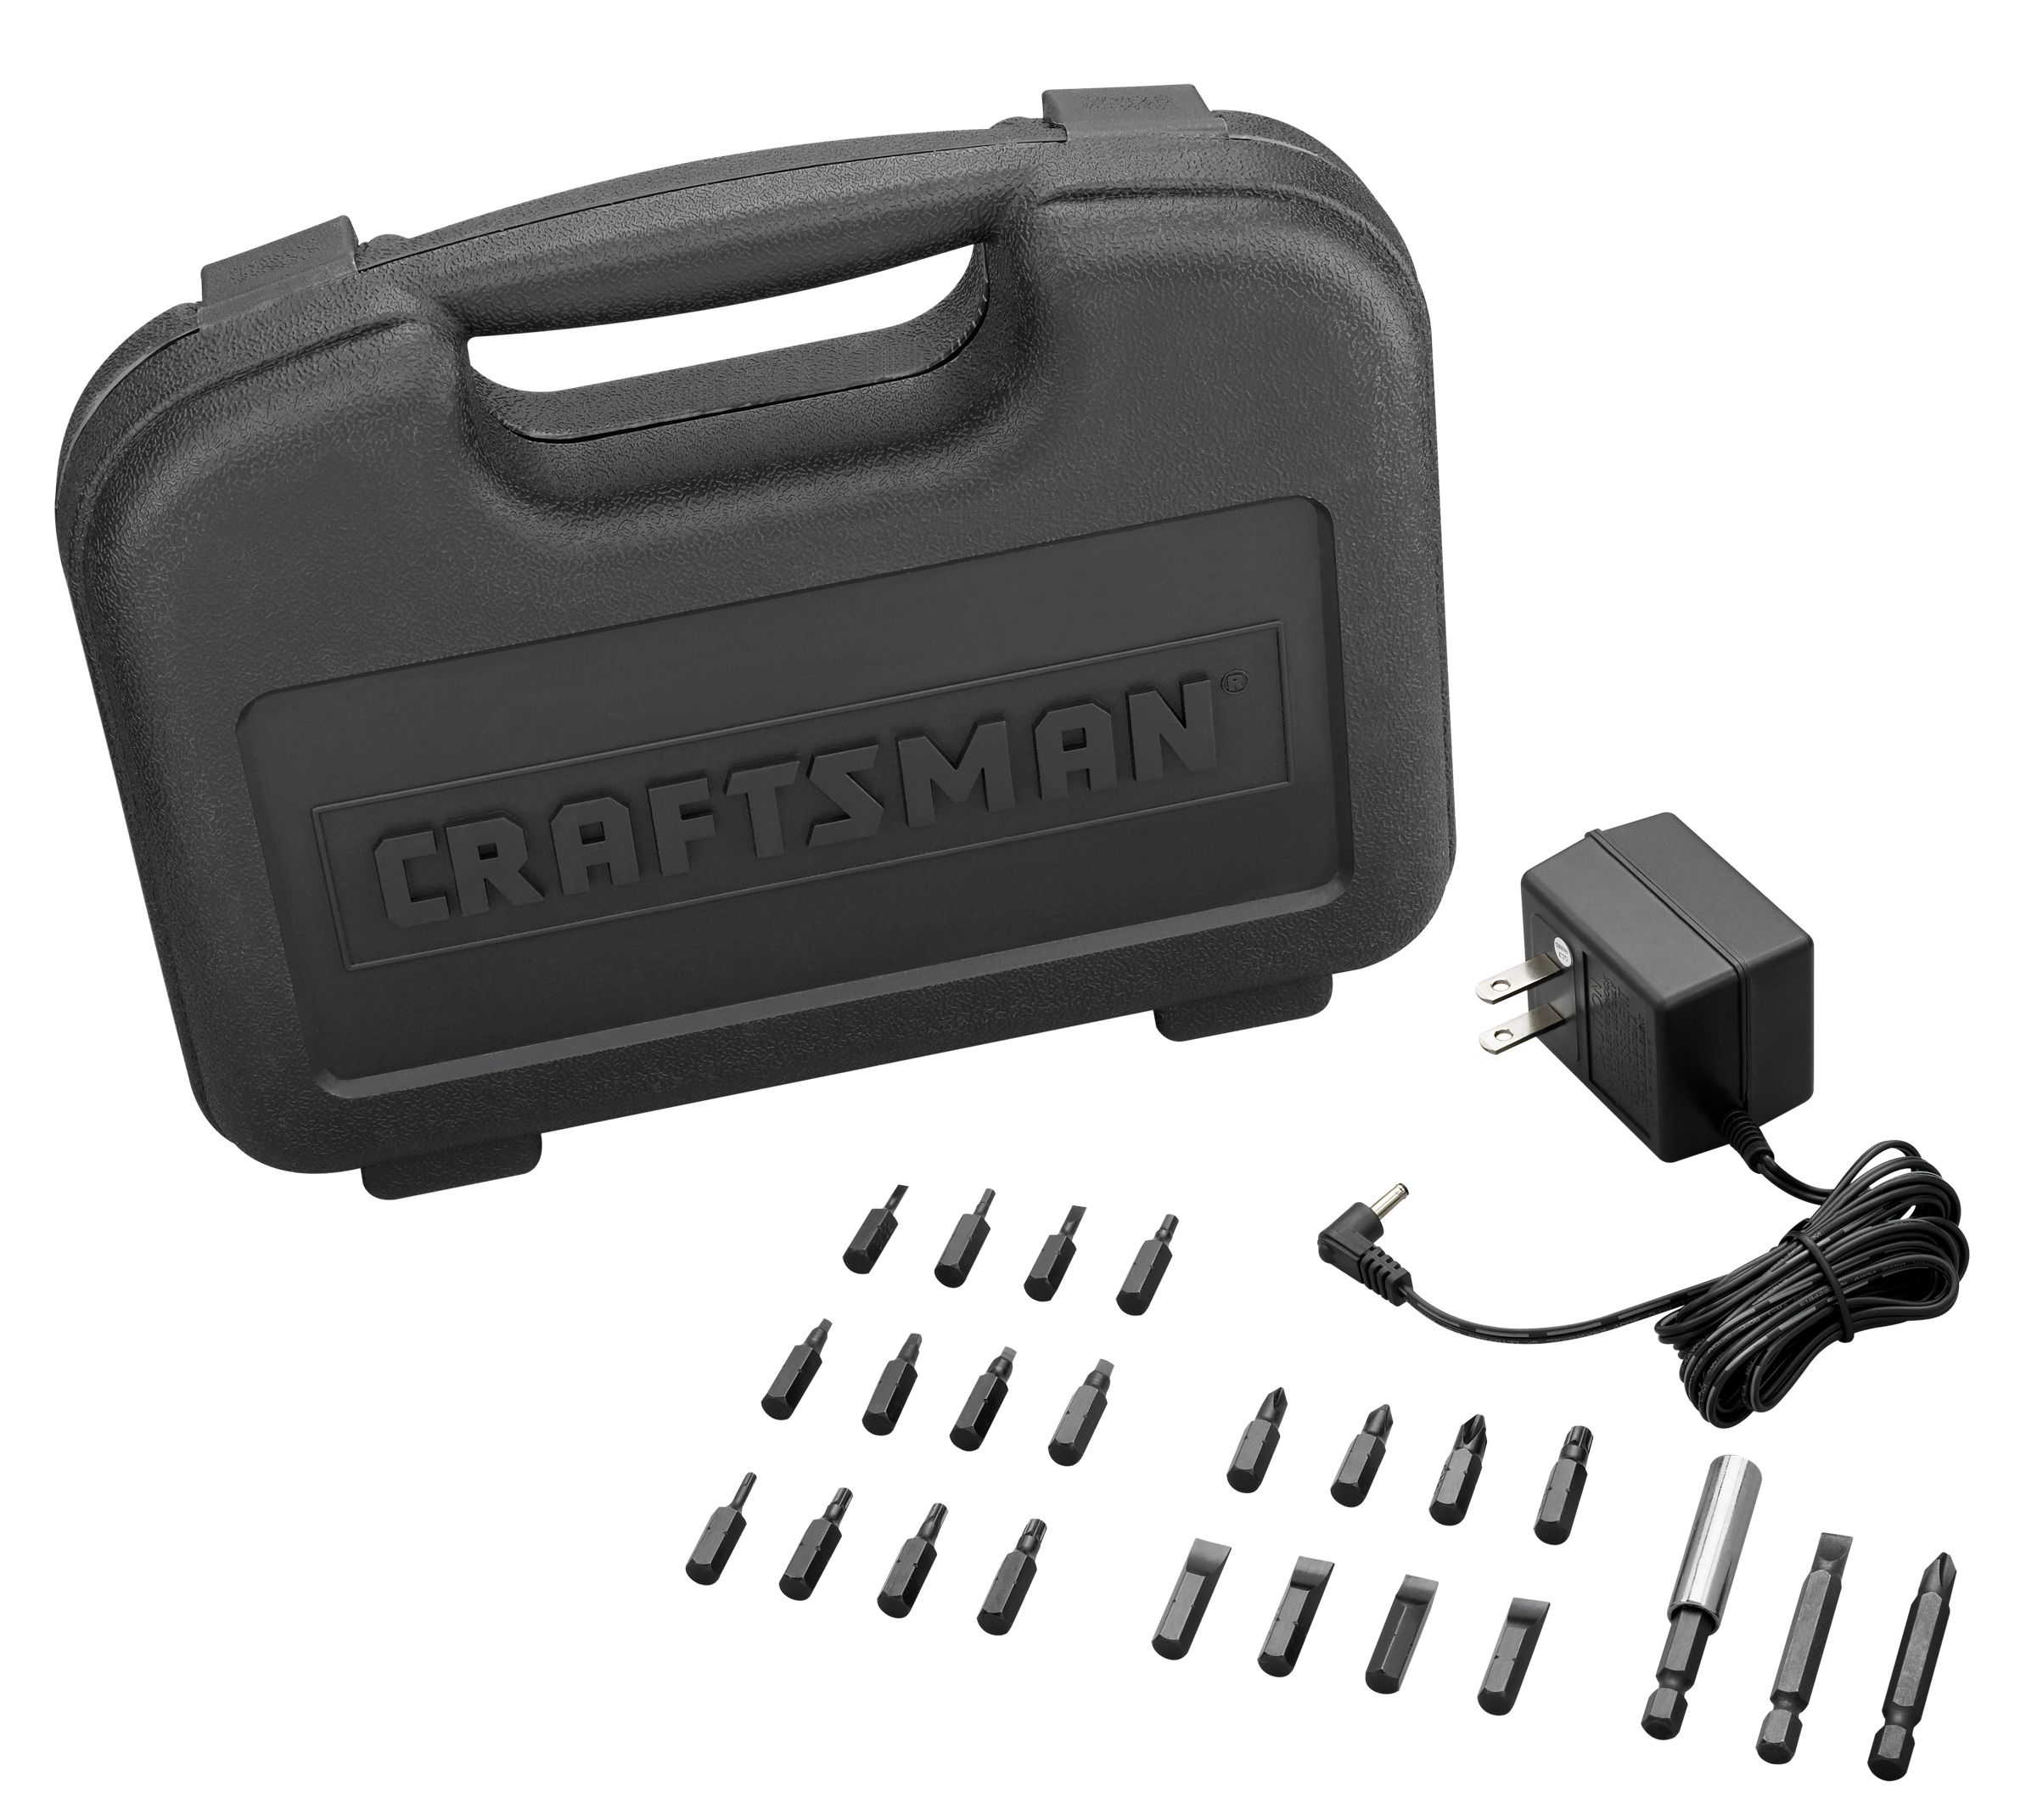 Craftsman 11779 7.2-volt Ni-Cd Cordless Screwdriver with Bit Set